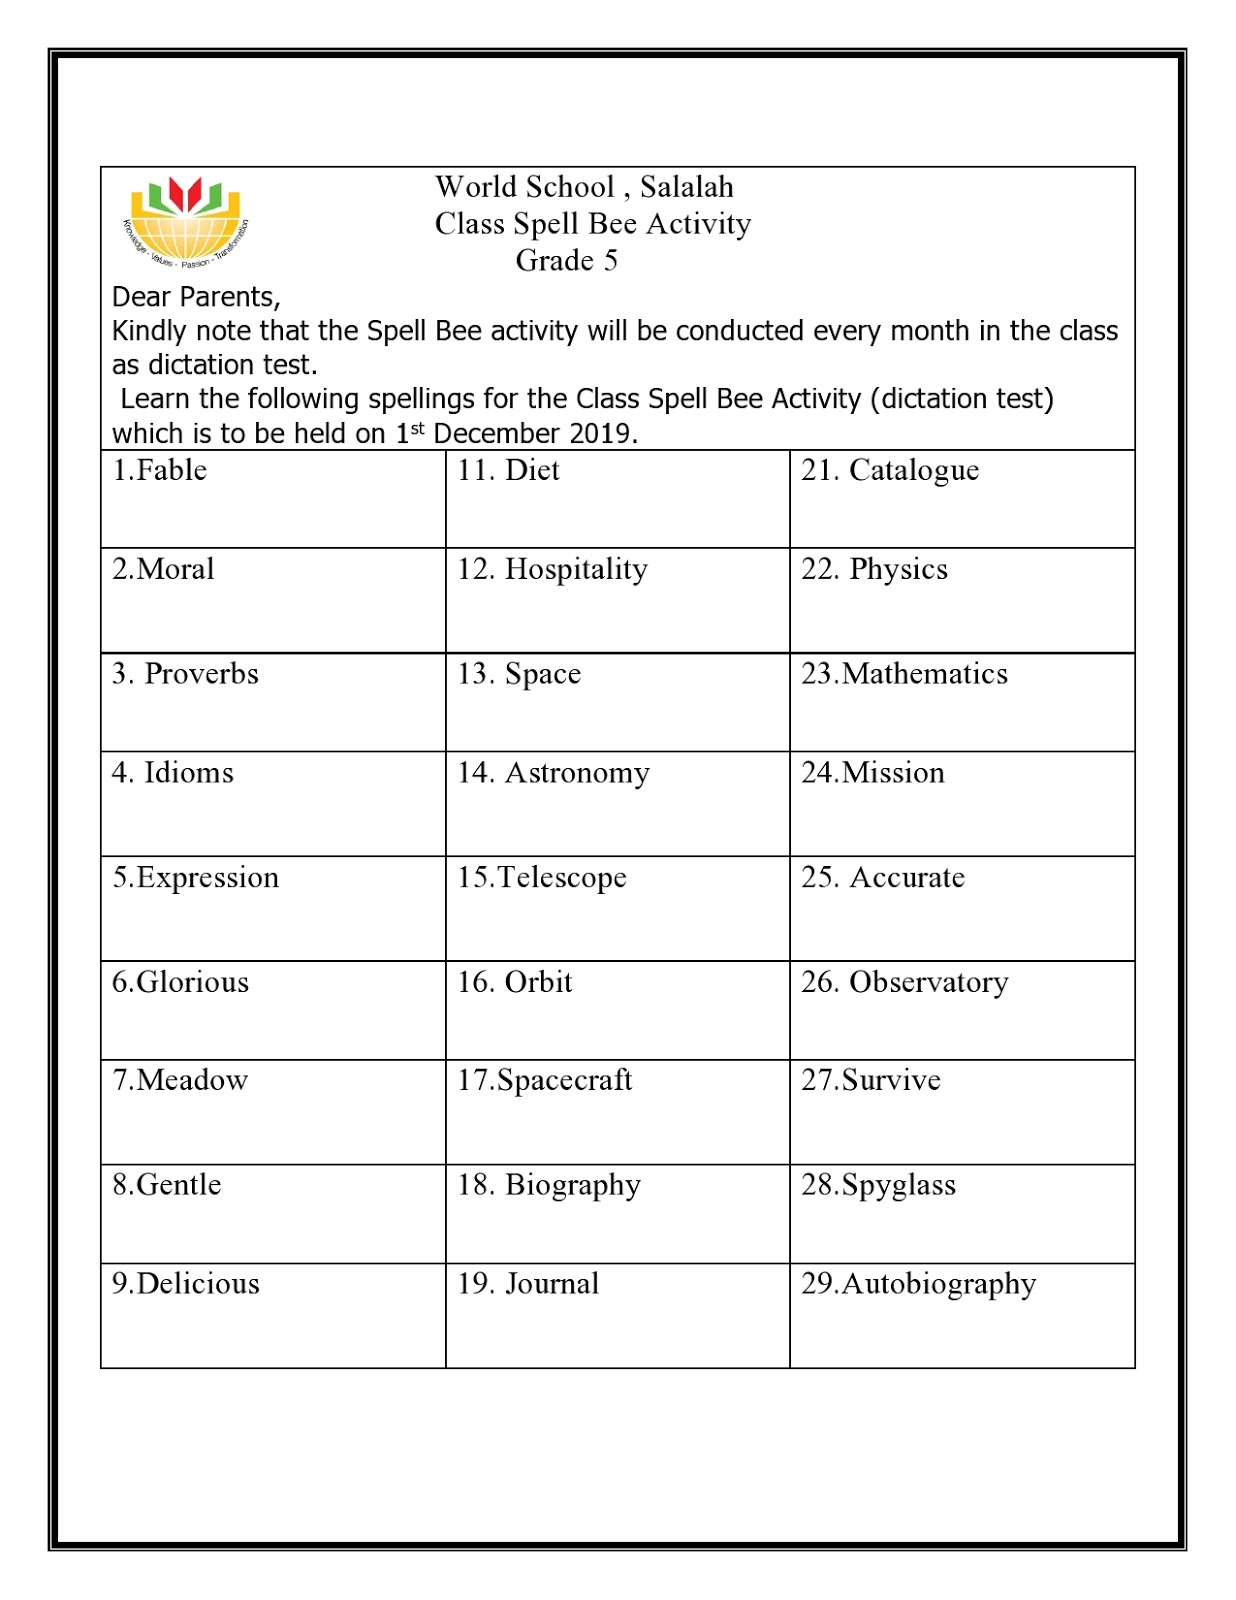 WORLD SCHOOL OMAN: Homework for Grade 5 as on 12-11-2019 [ 1600 x 1236 Pixel ]